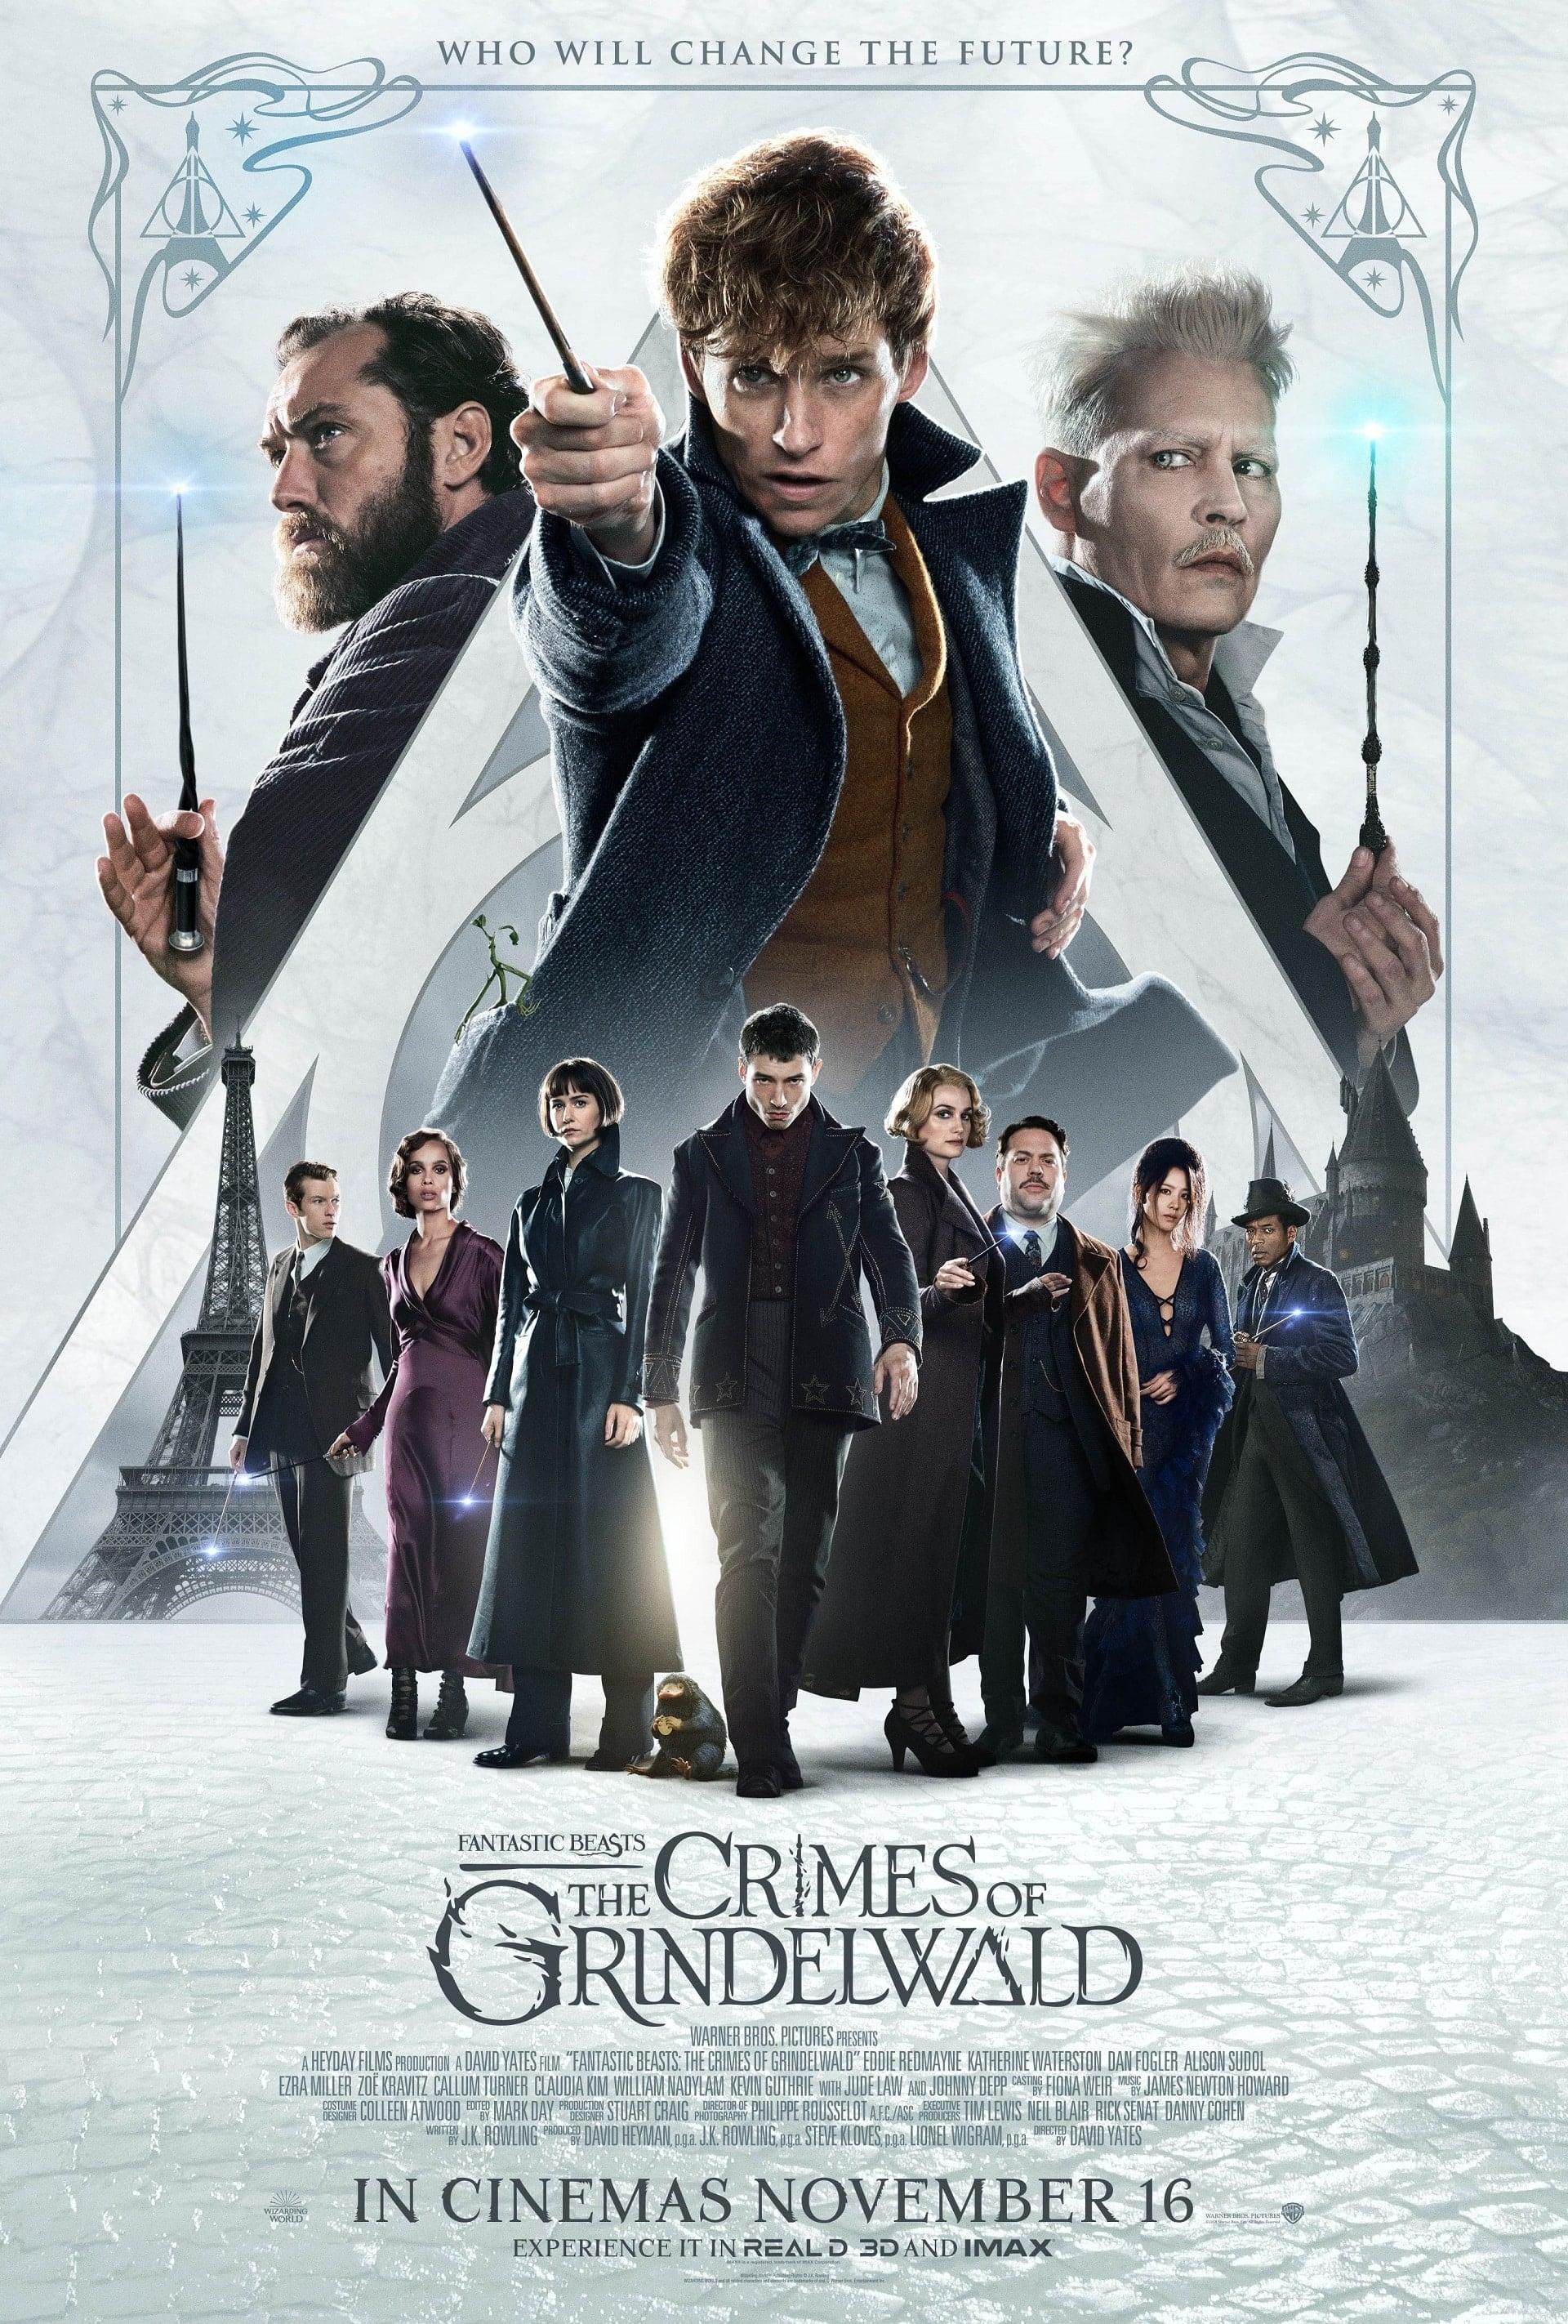 Fantastic Beasts 2 The Crimes of Grindelwald